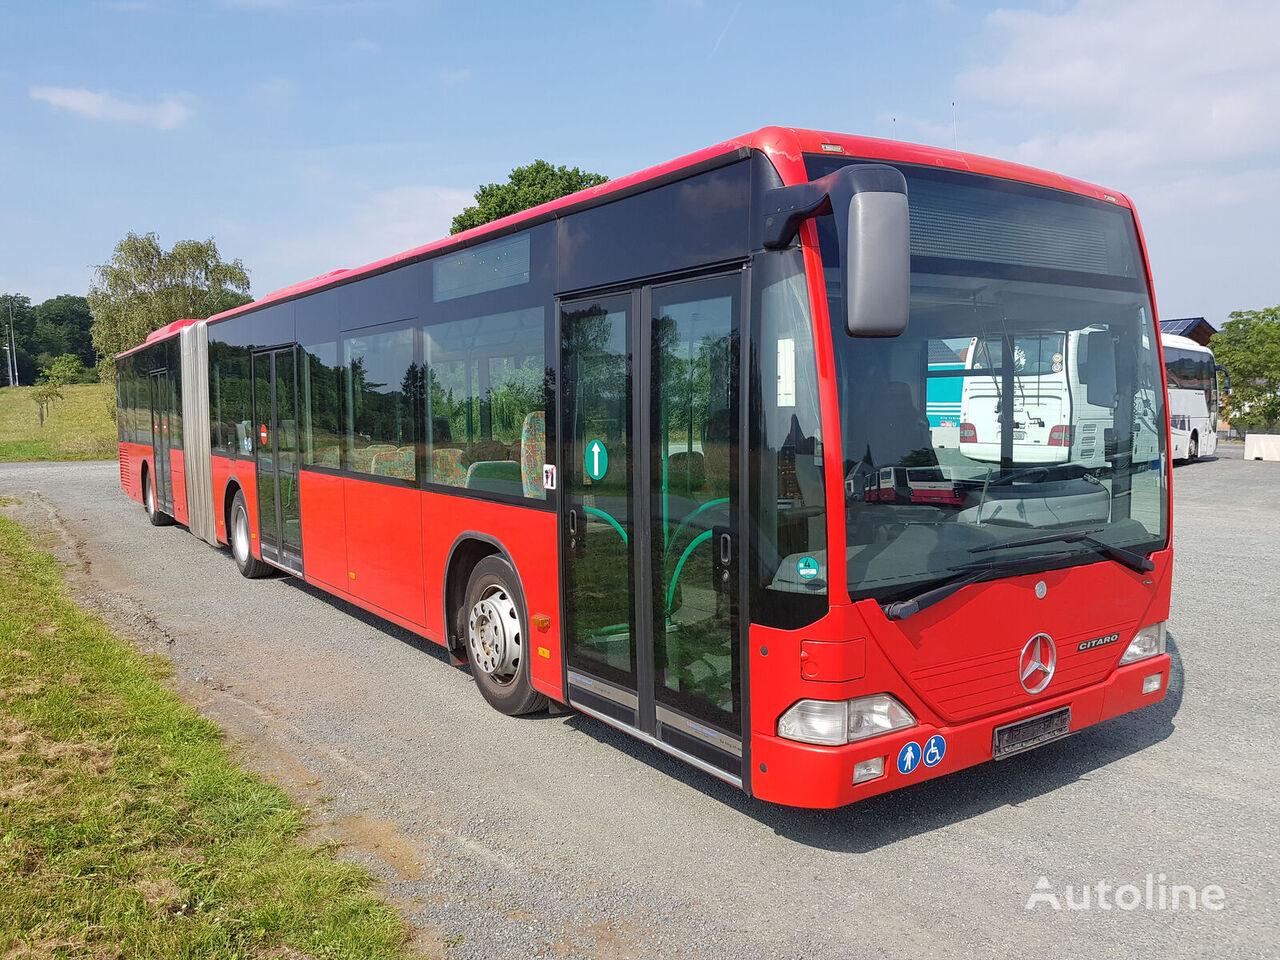 MERCEDES-BENZ 530 G KLIMA Euro 4 Getriebe/ NEW articulated bus